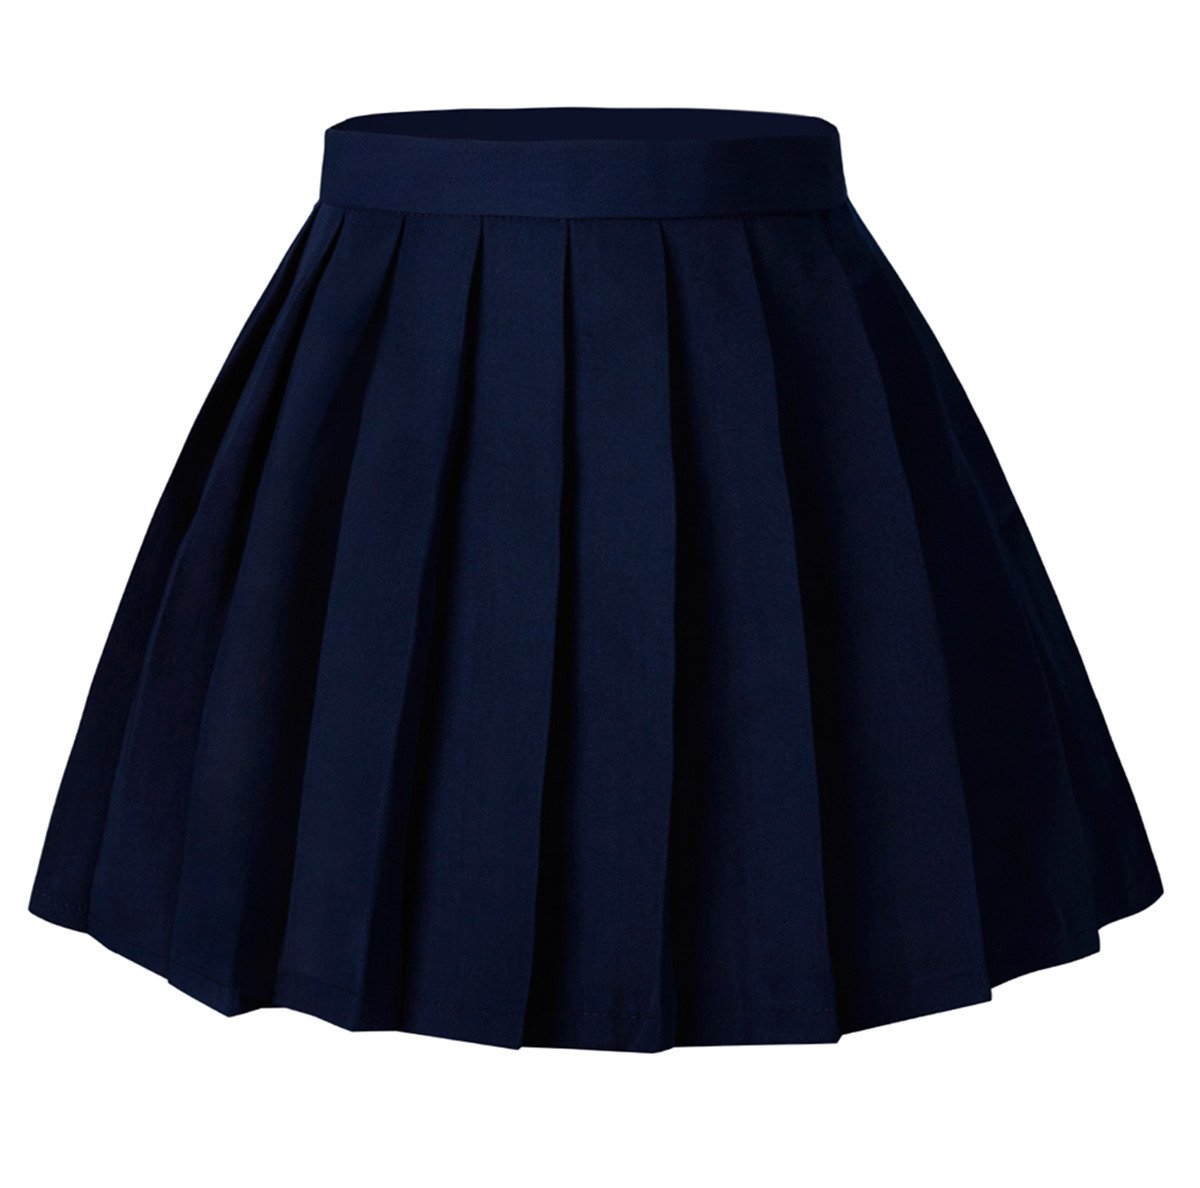 Tremour Women's School High Waist Pleated Skirts Solid Color Wear(2XL,Dark Blue)